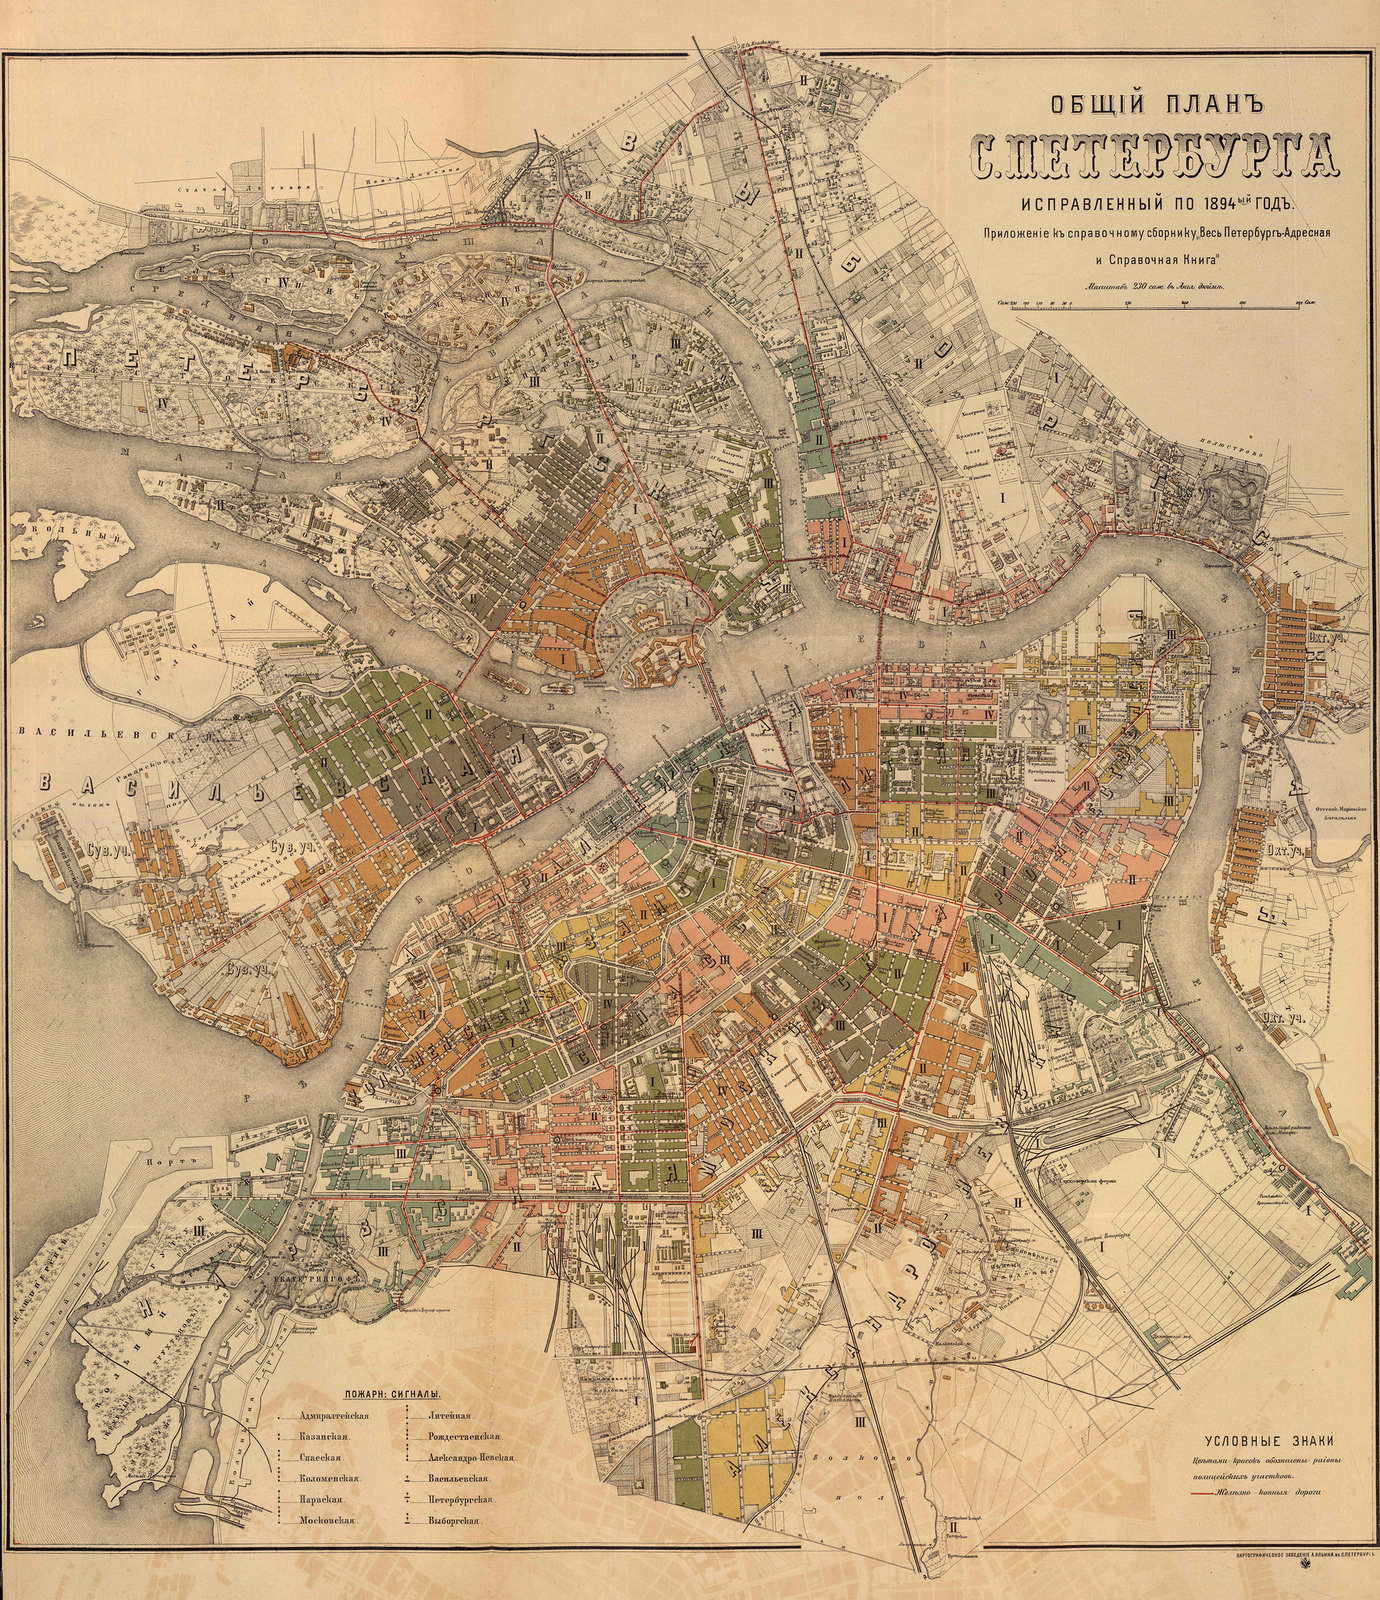 02. Общий план Петербурга. 1894